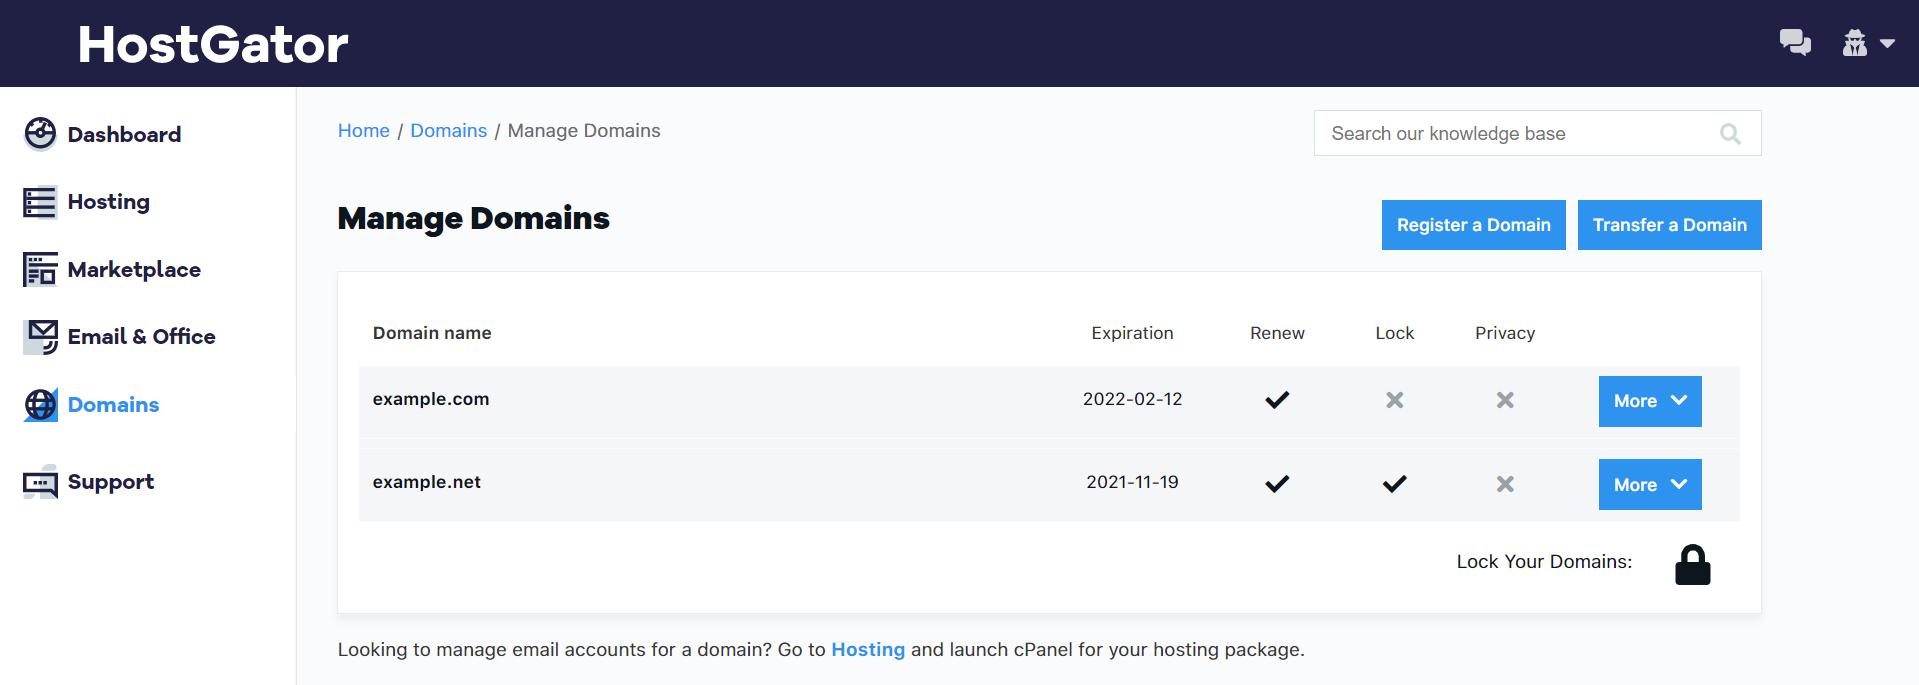 HostGator Customer Portal Manage Domains